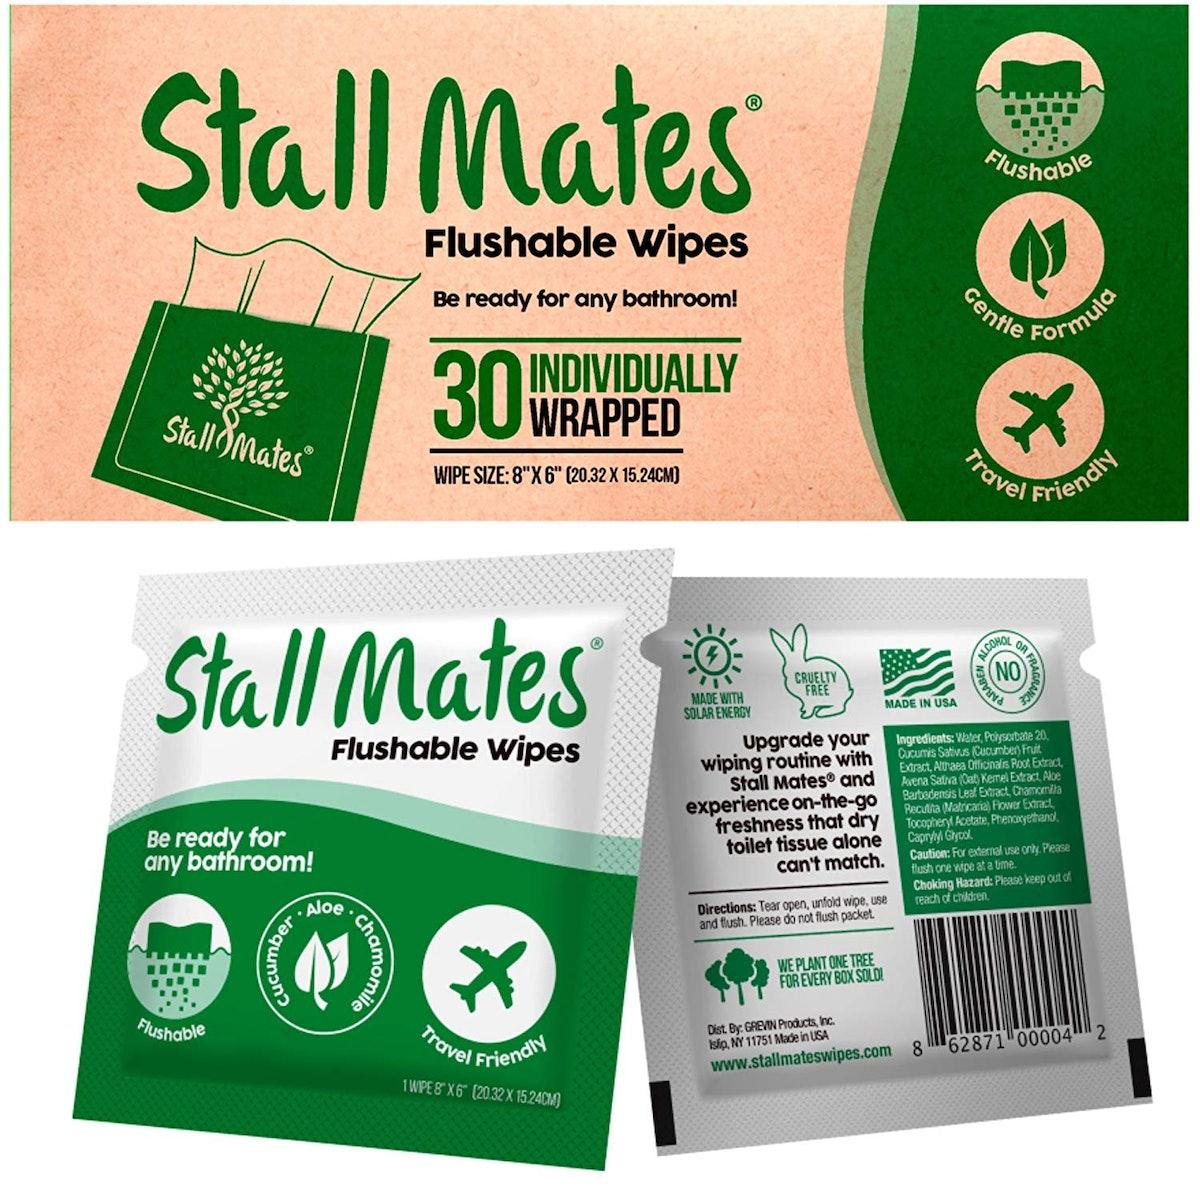 Stall Mates Flushable Wipes